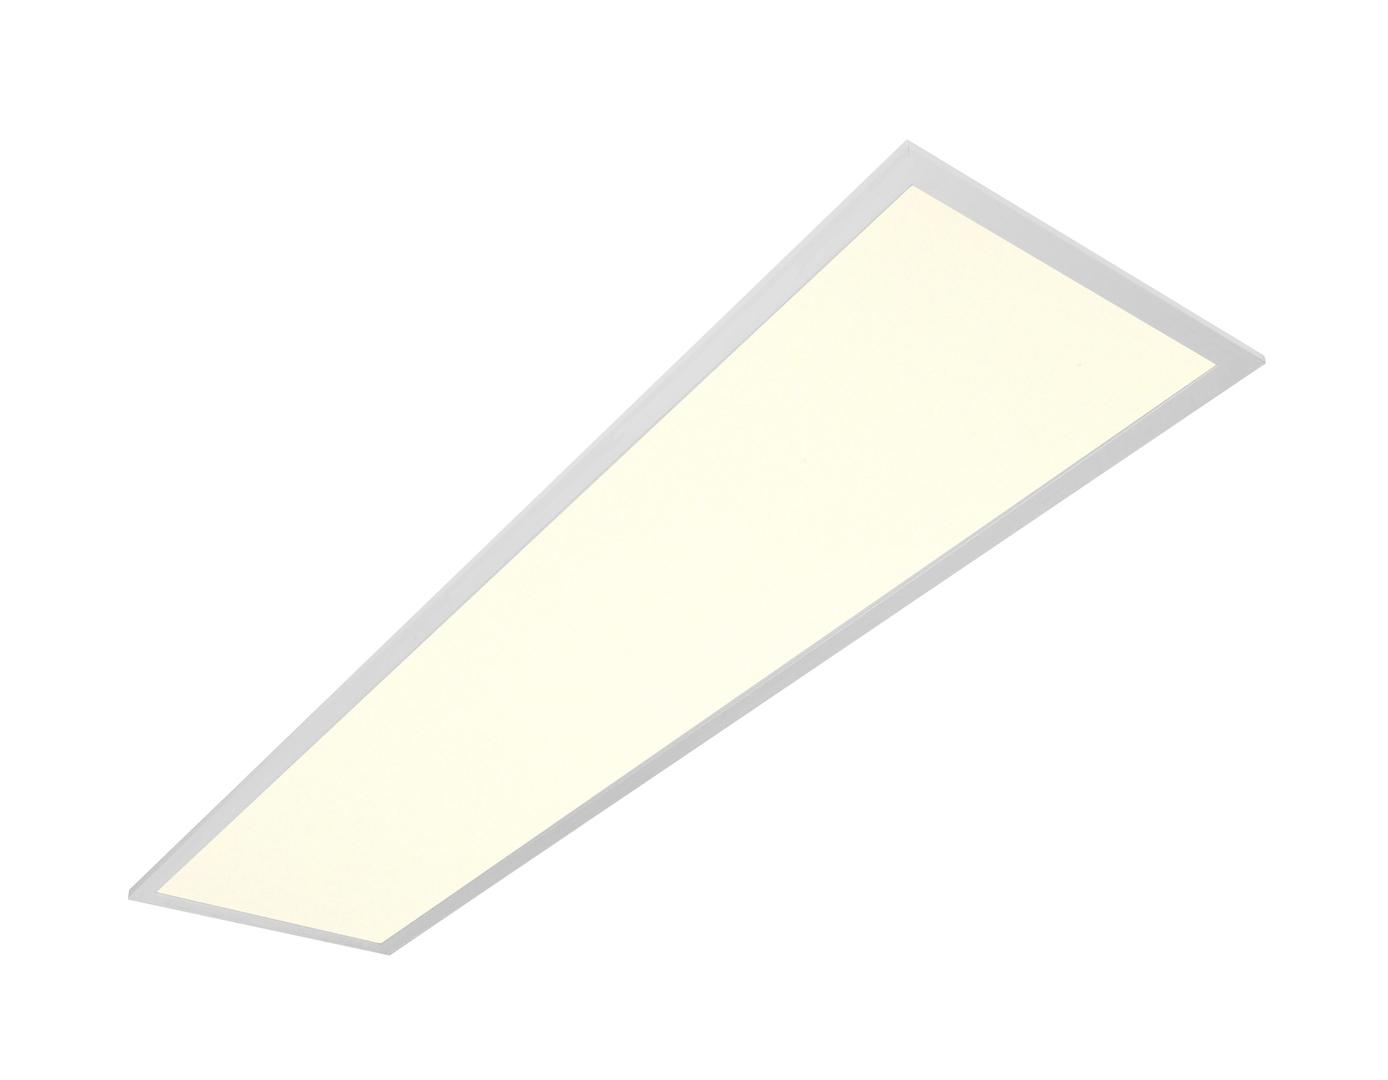 LED panel white rectangle 80W 230V IP20 4000K - Natural light color